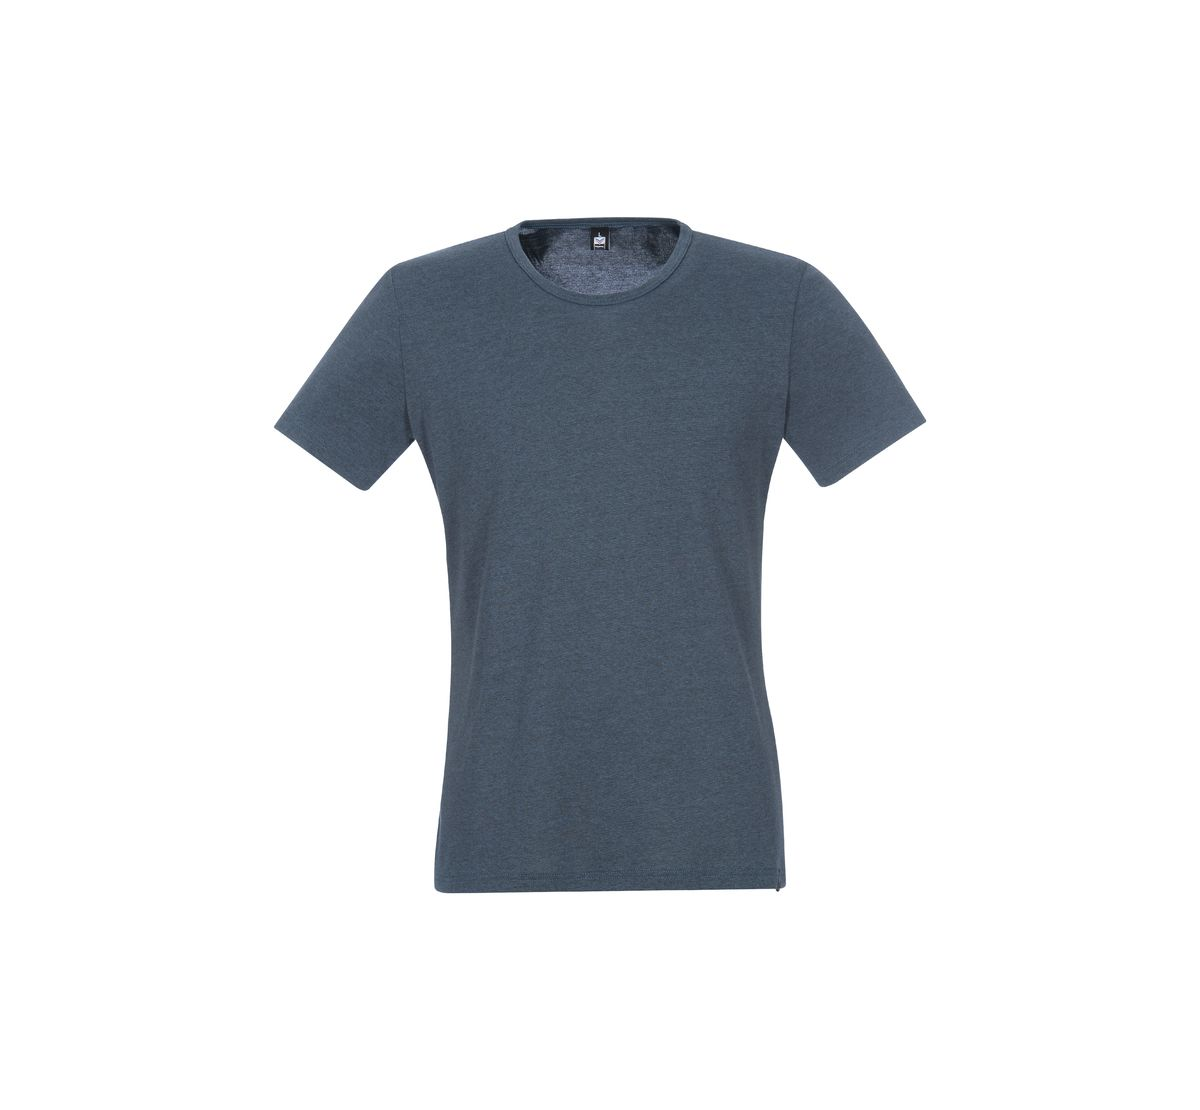 3fff19e4fc8cf2 TRIGEMA T-Shirt aus Baumwolle Elastan